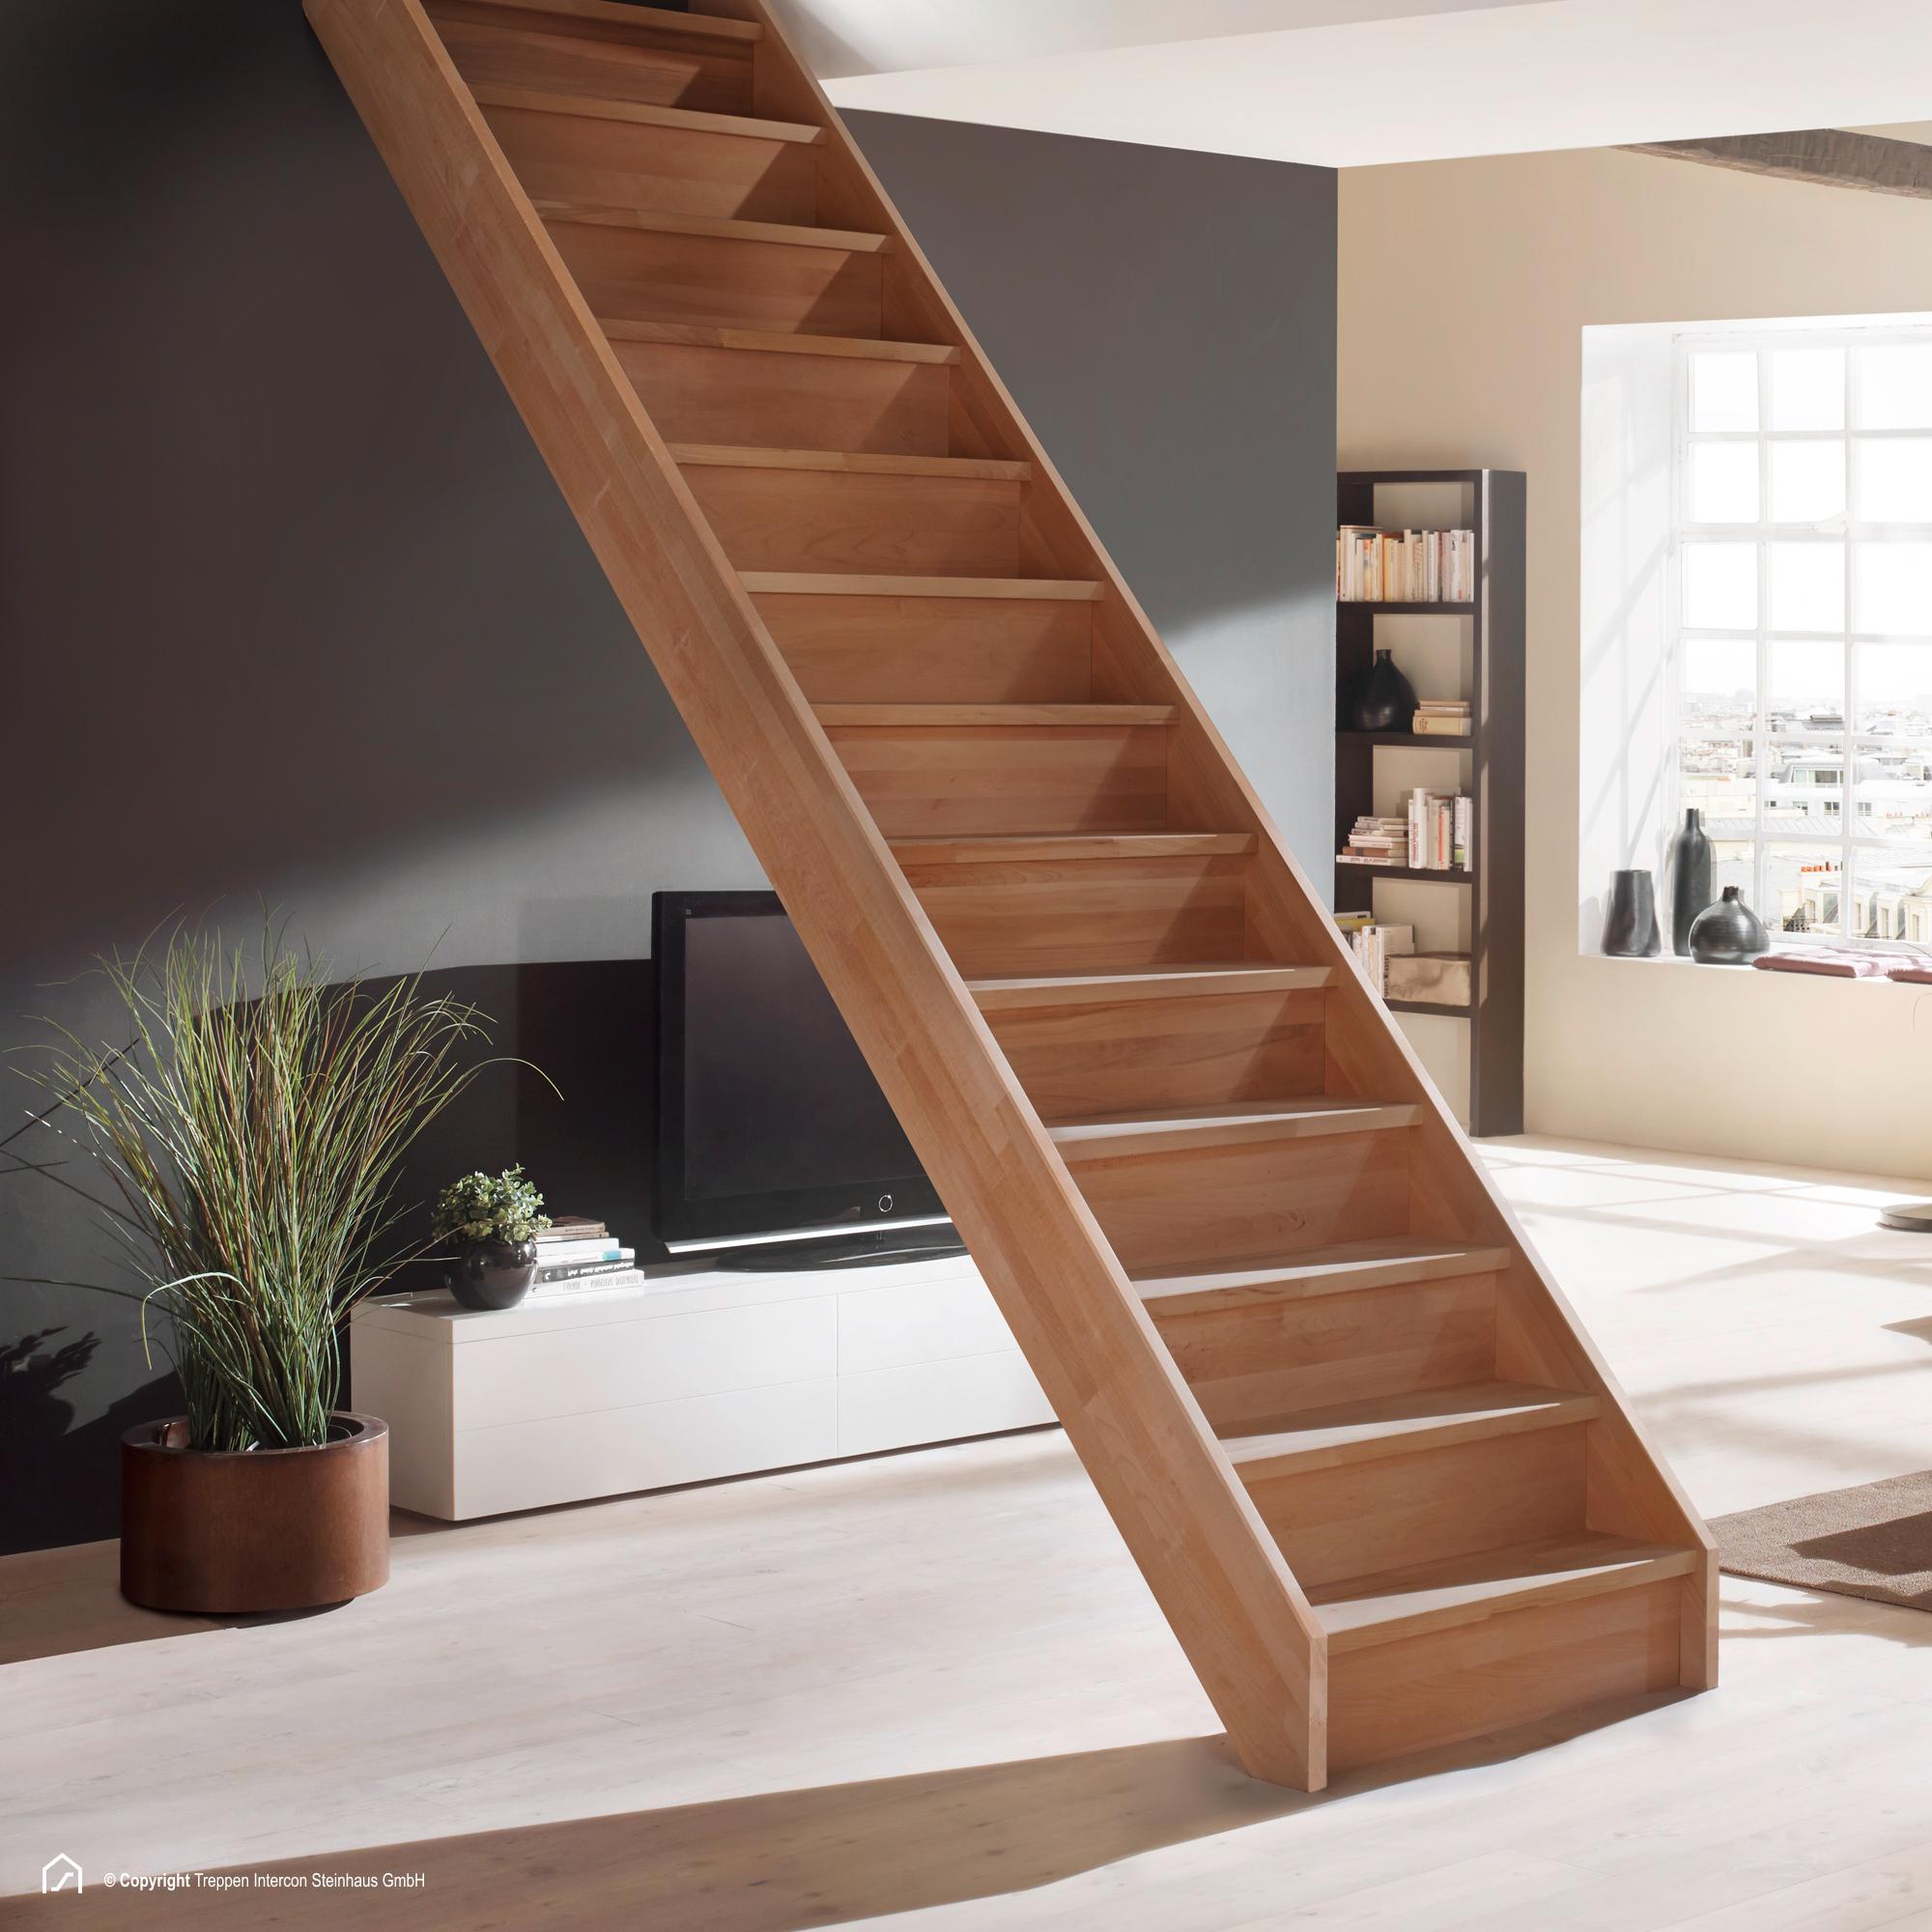 massivholztreppen savoy online kaufen bei treppen intercon. Black Bedroom Furniture Sets. Home Design Ideas